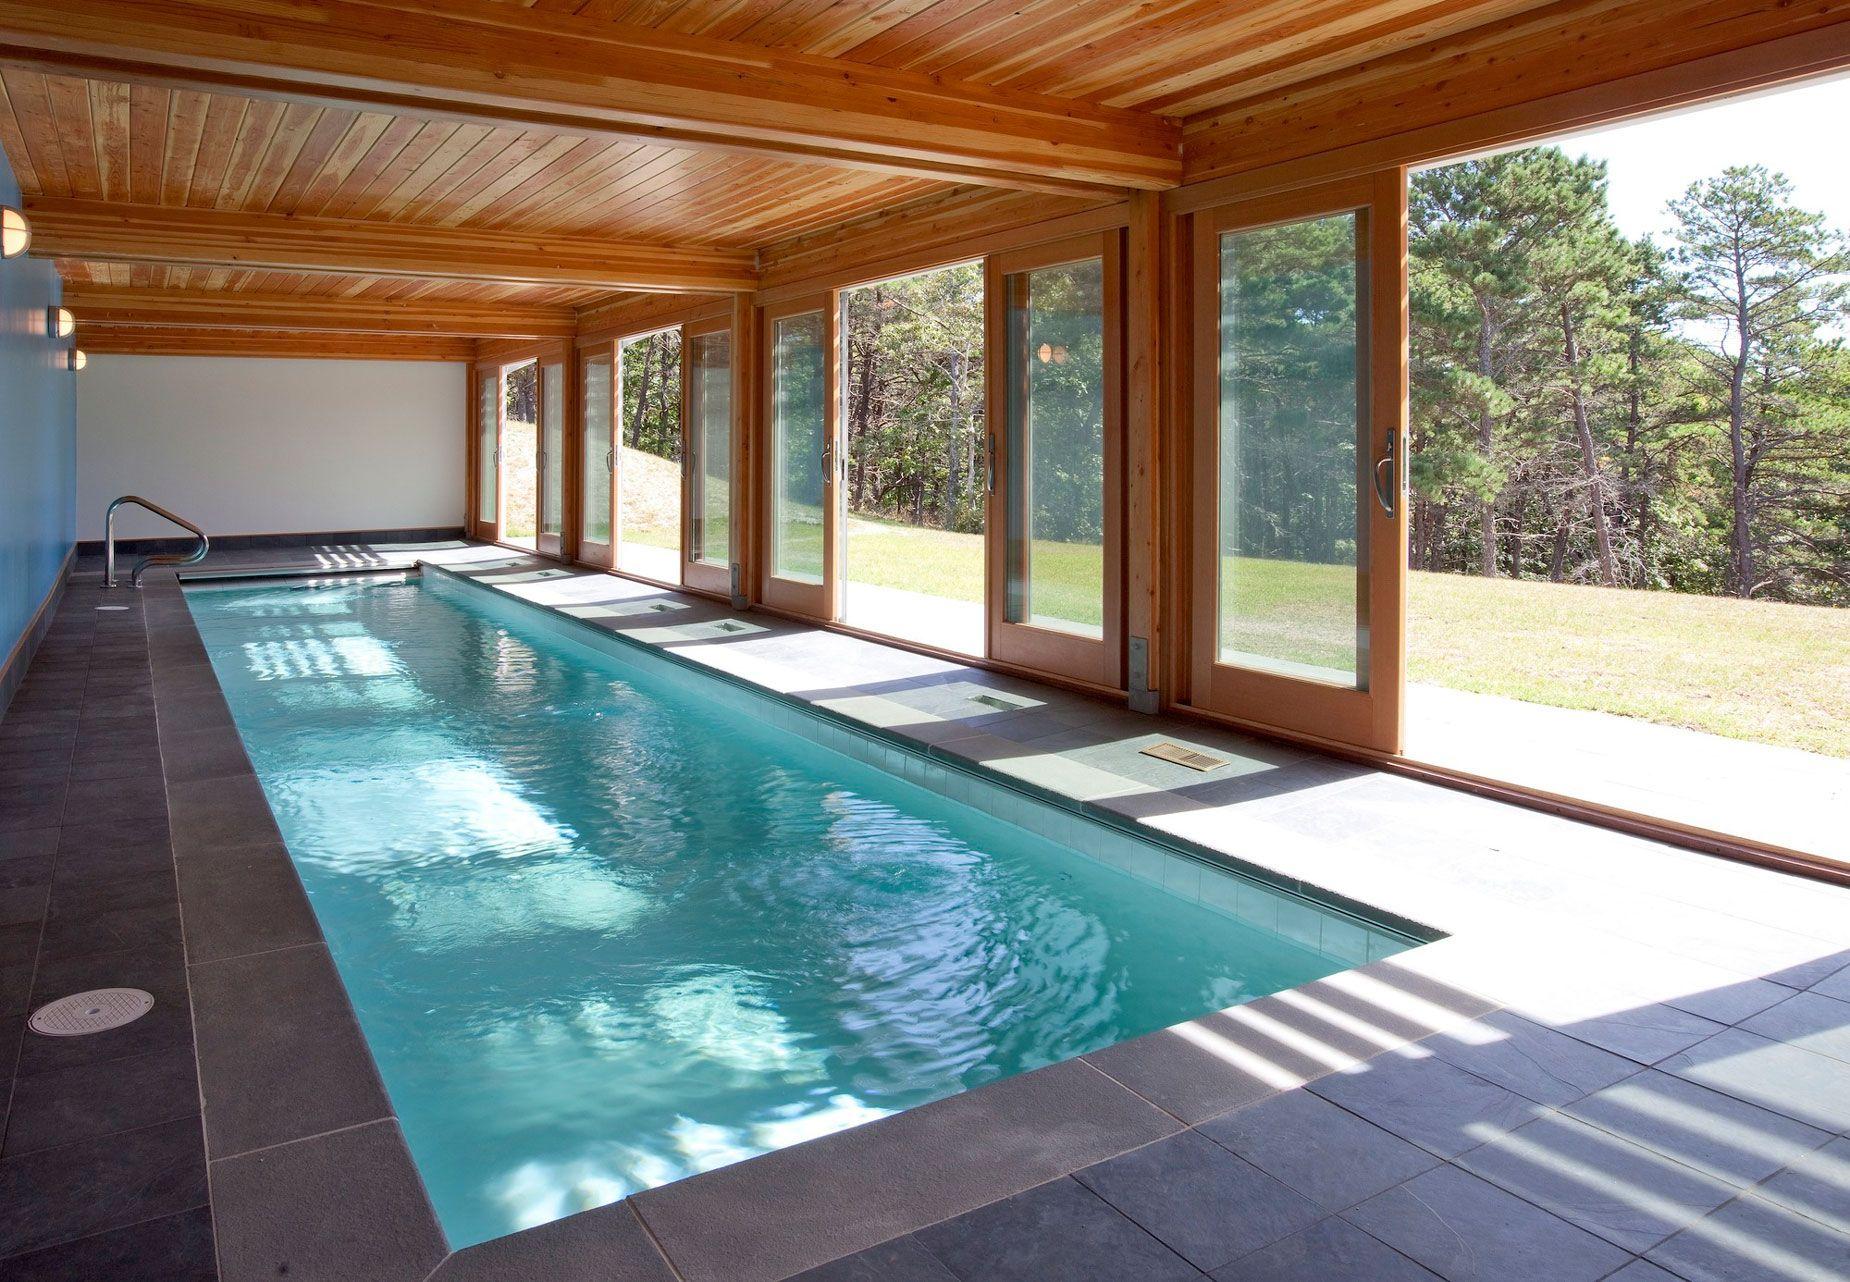 Indoor Pool Ideas Decor Swimming Design Tags Inground Backyard Modern Inexpensive